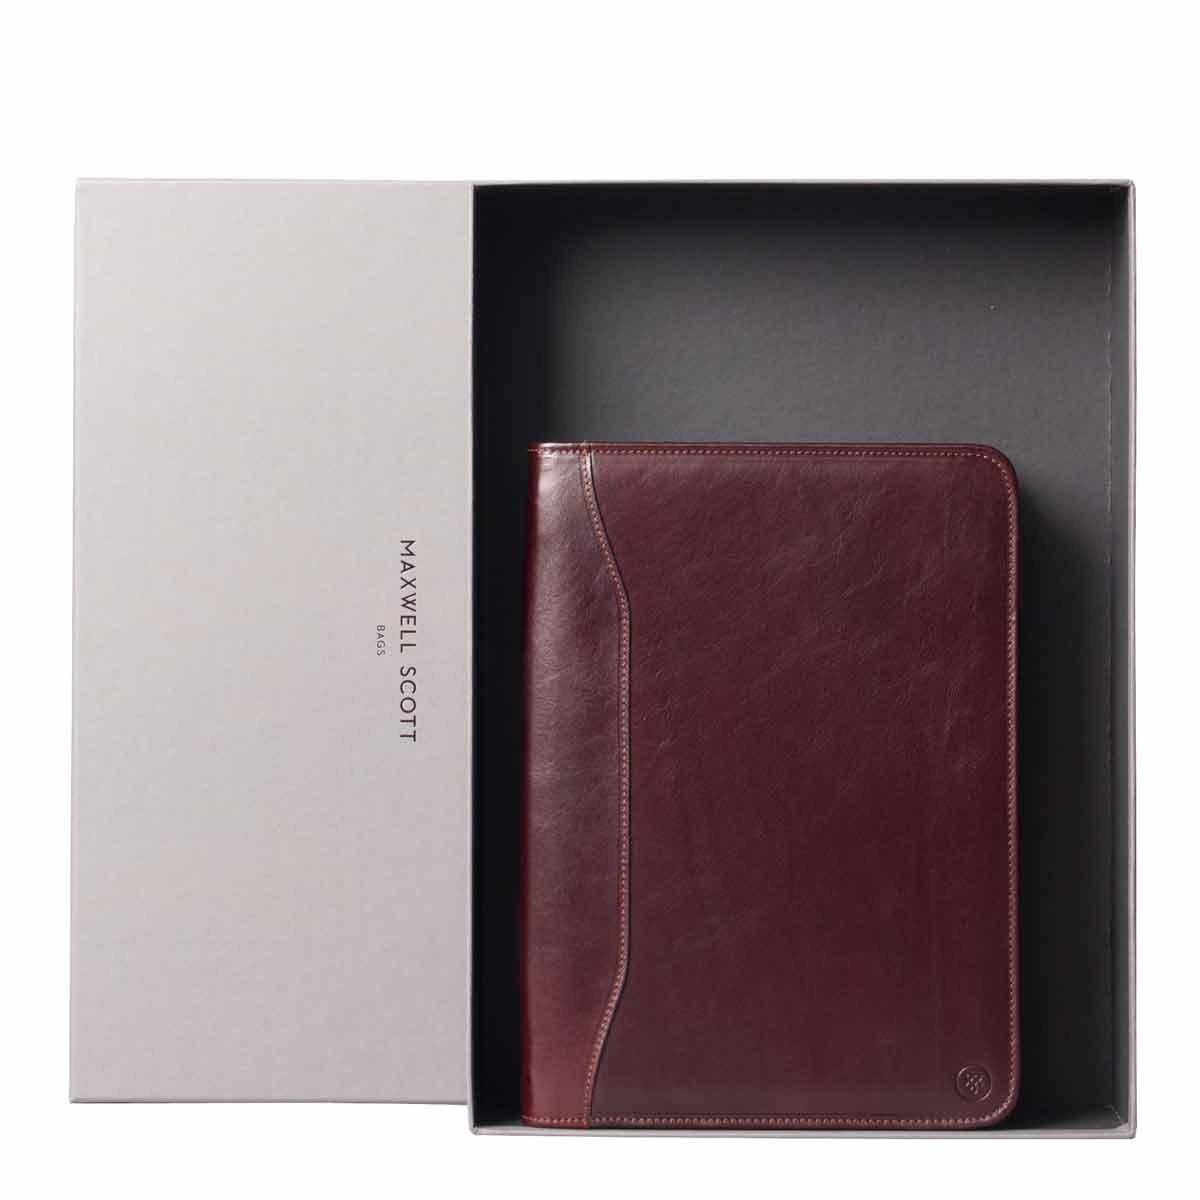 Maxwell Scott Luxury Italian Zipped Mock Croc Leather Document Folder - Tan